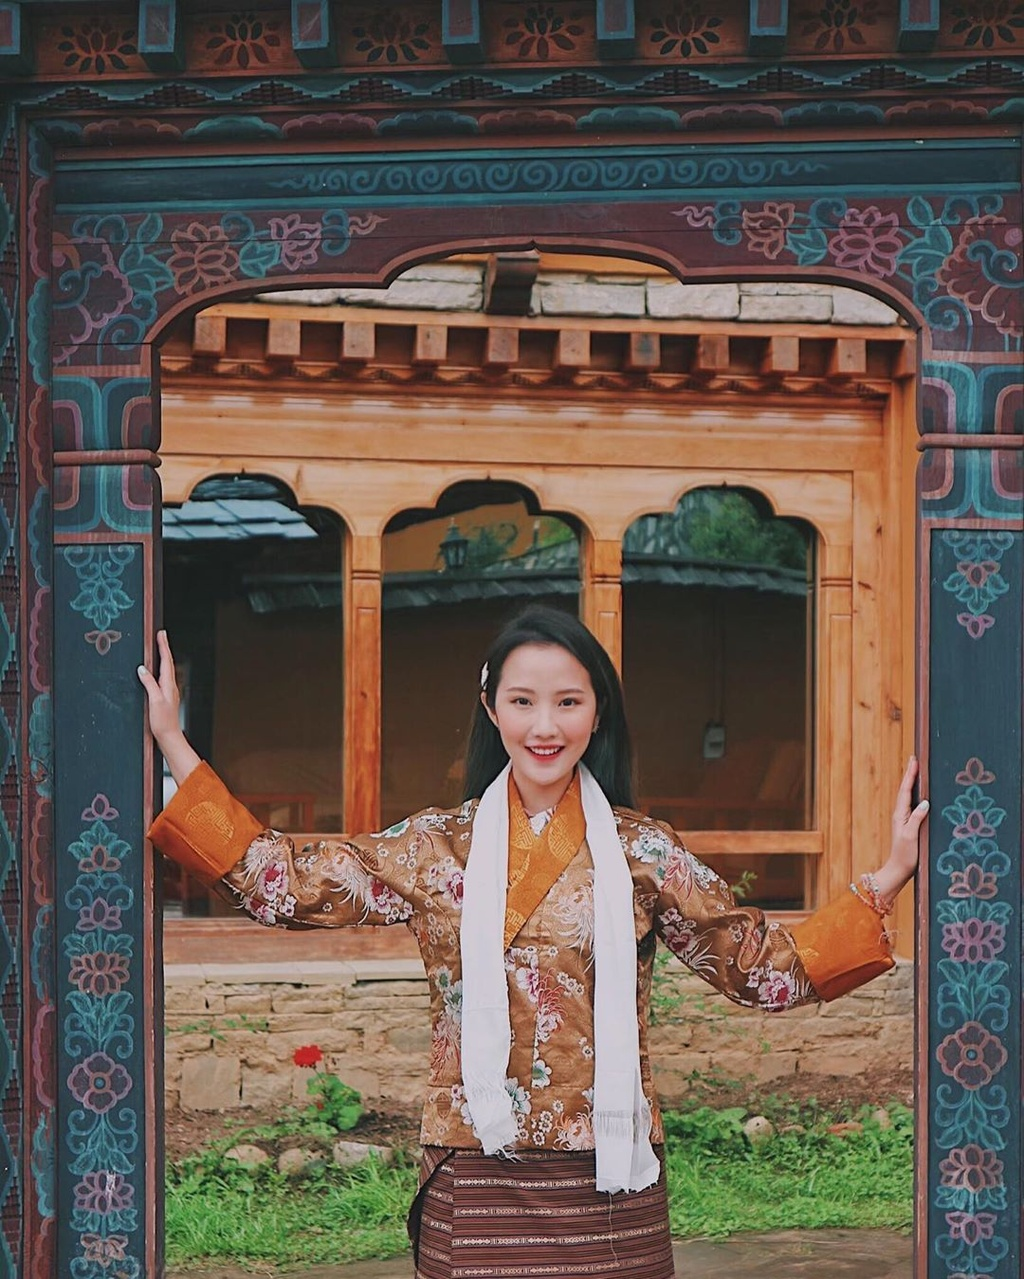 Kinh nghiem du lich Bhutan - vuong quoc hanh phuc nhat the gioi hinh anh 29 70034879_340809330137799_374595184592807974_n_1__1.jpg